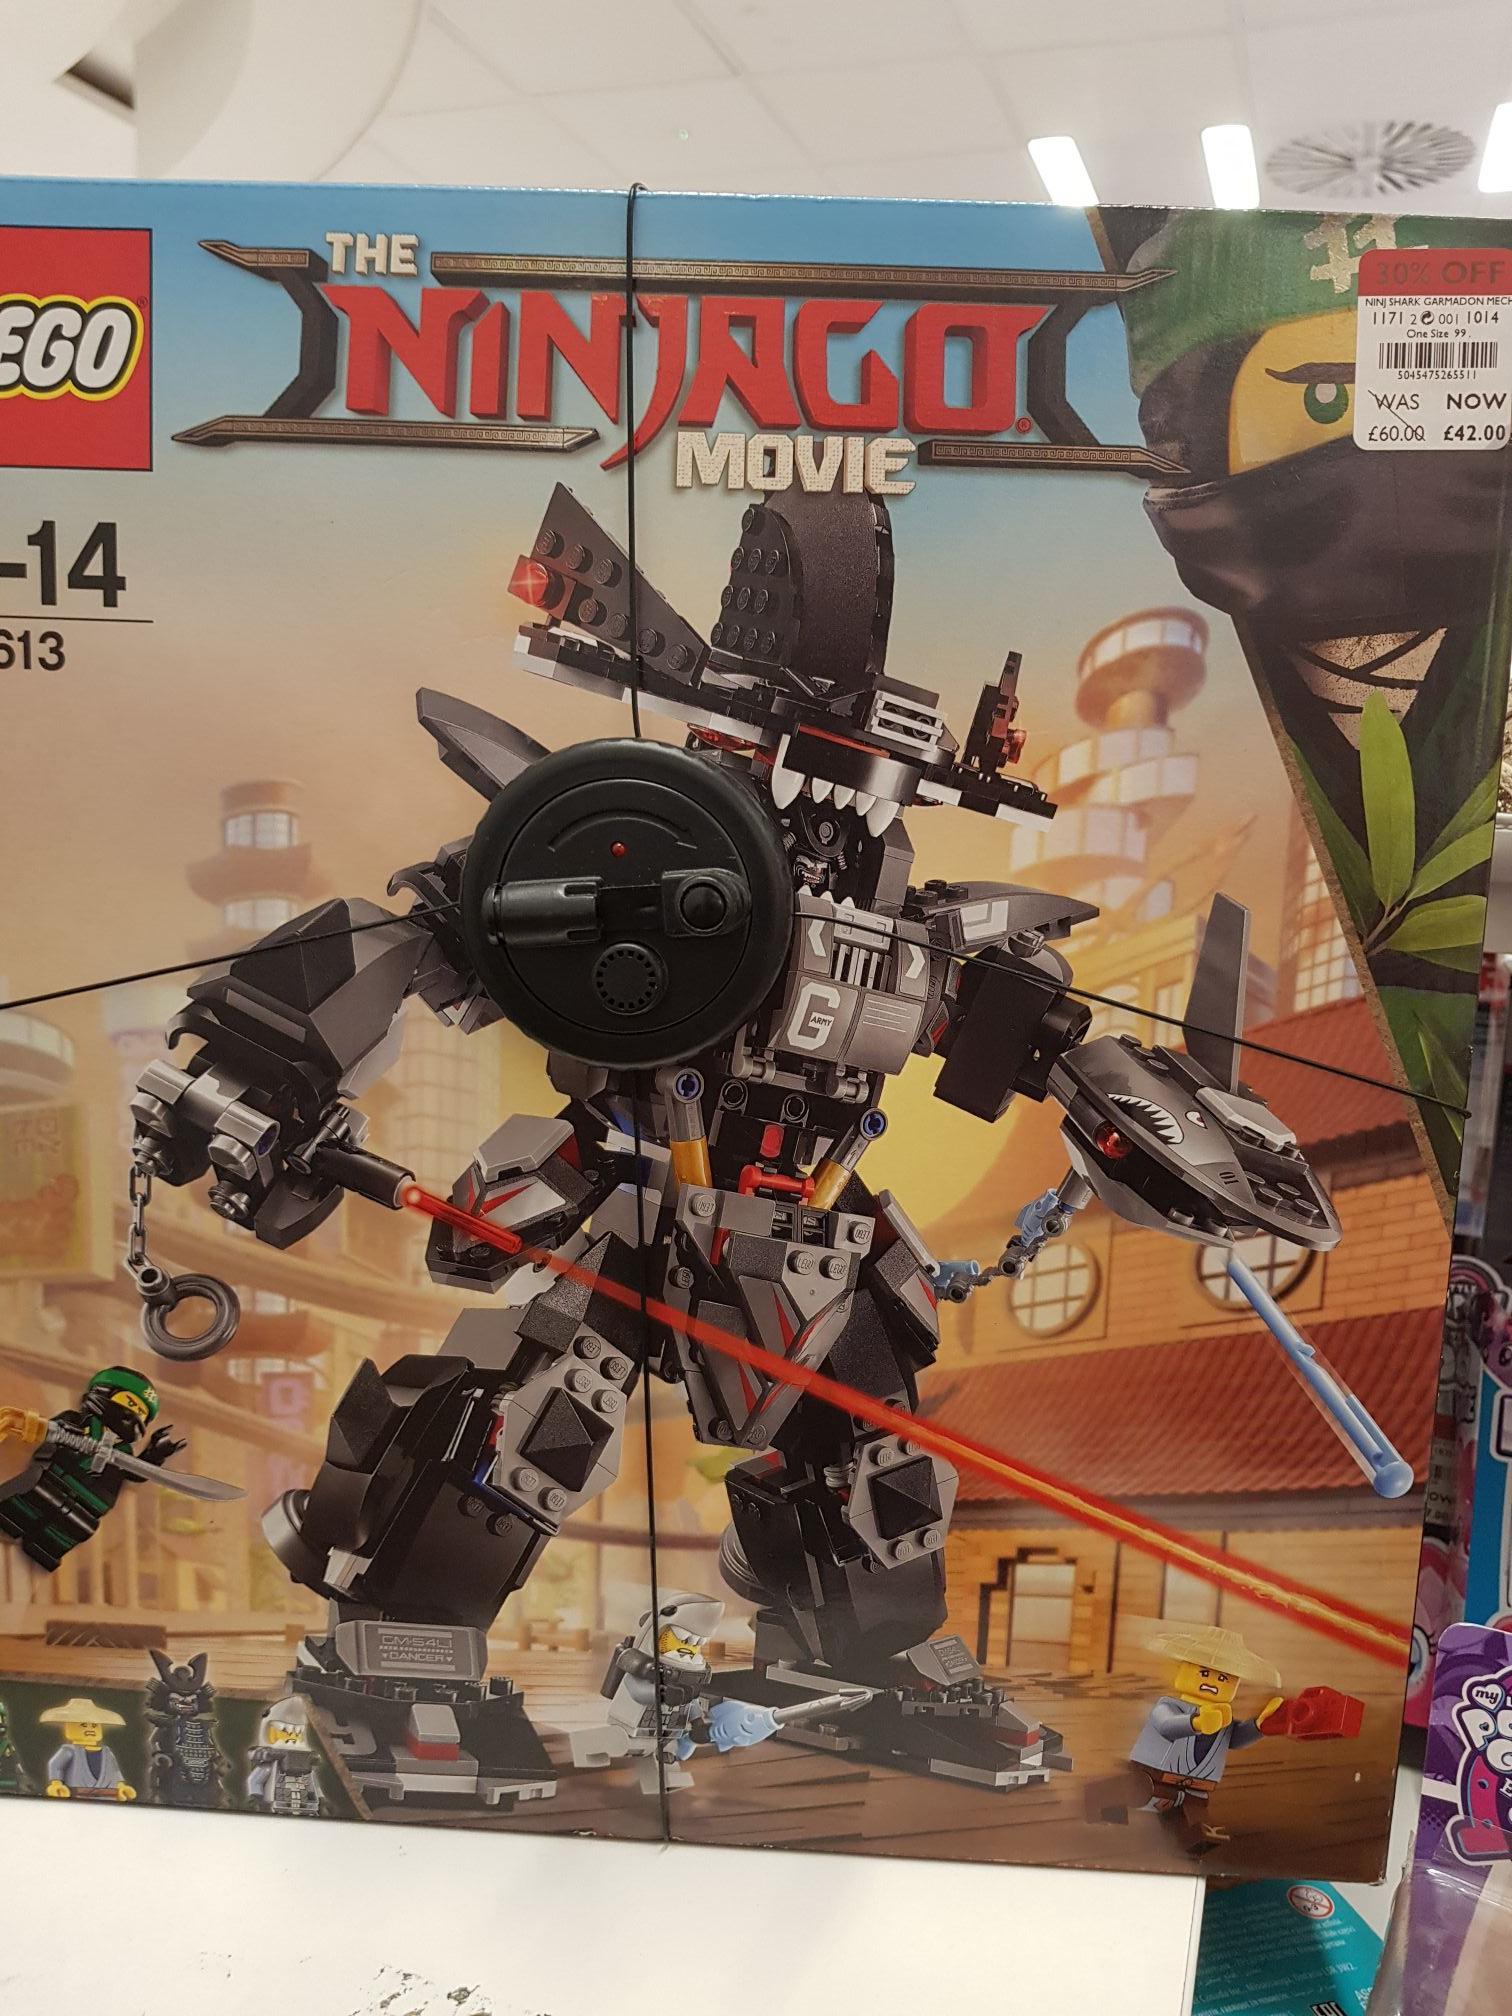 Lego Ninjago Movie in store Debenhams Bull Ring for £42